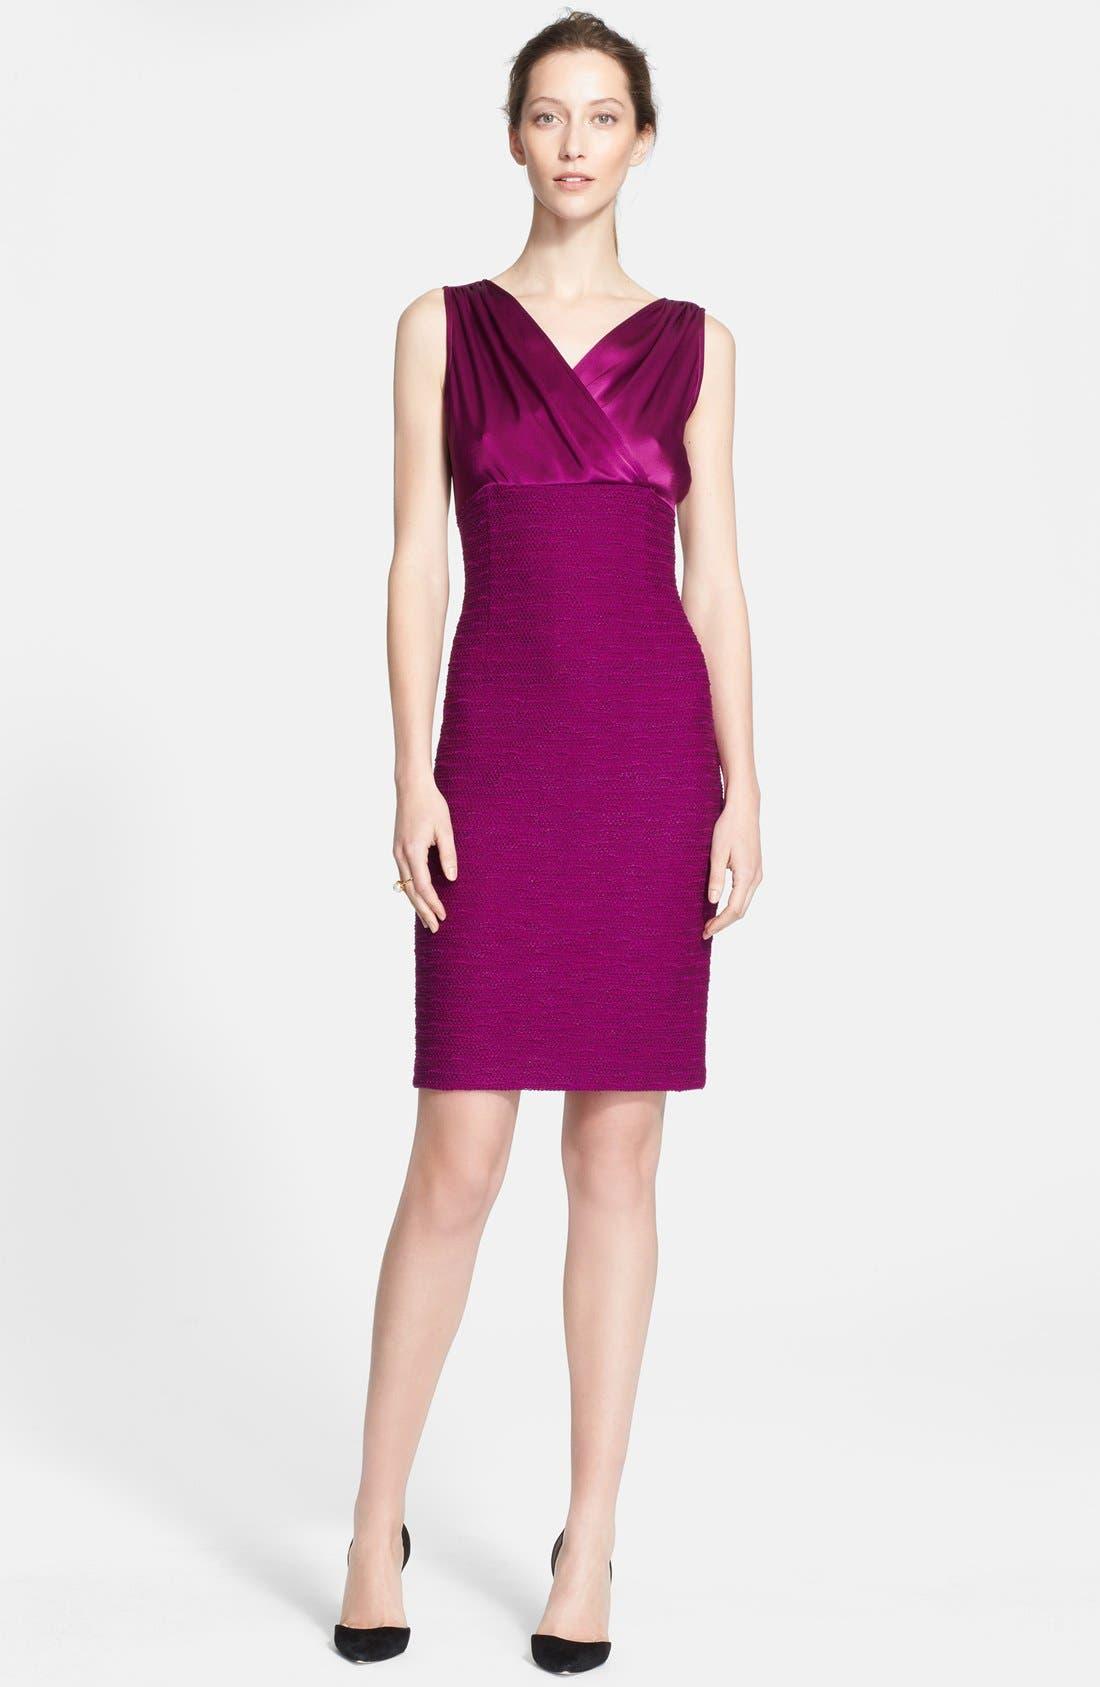 Main Image - St. John Collection Liquid Satin & New Shantung Knit Dress (Online Only)